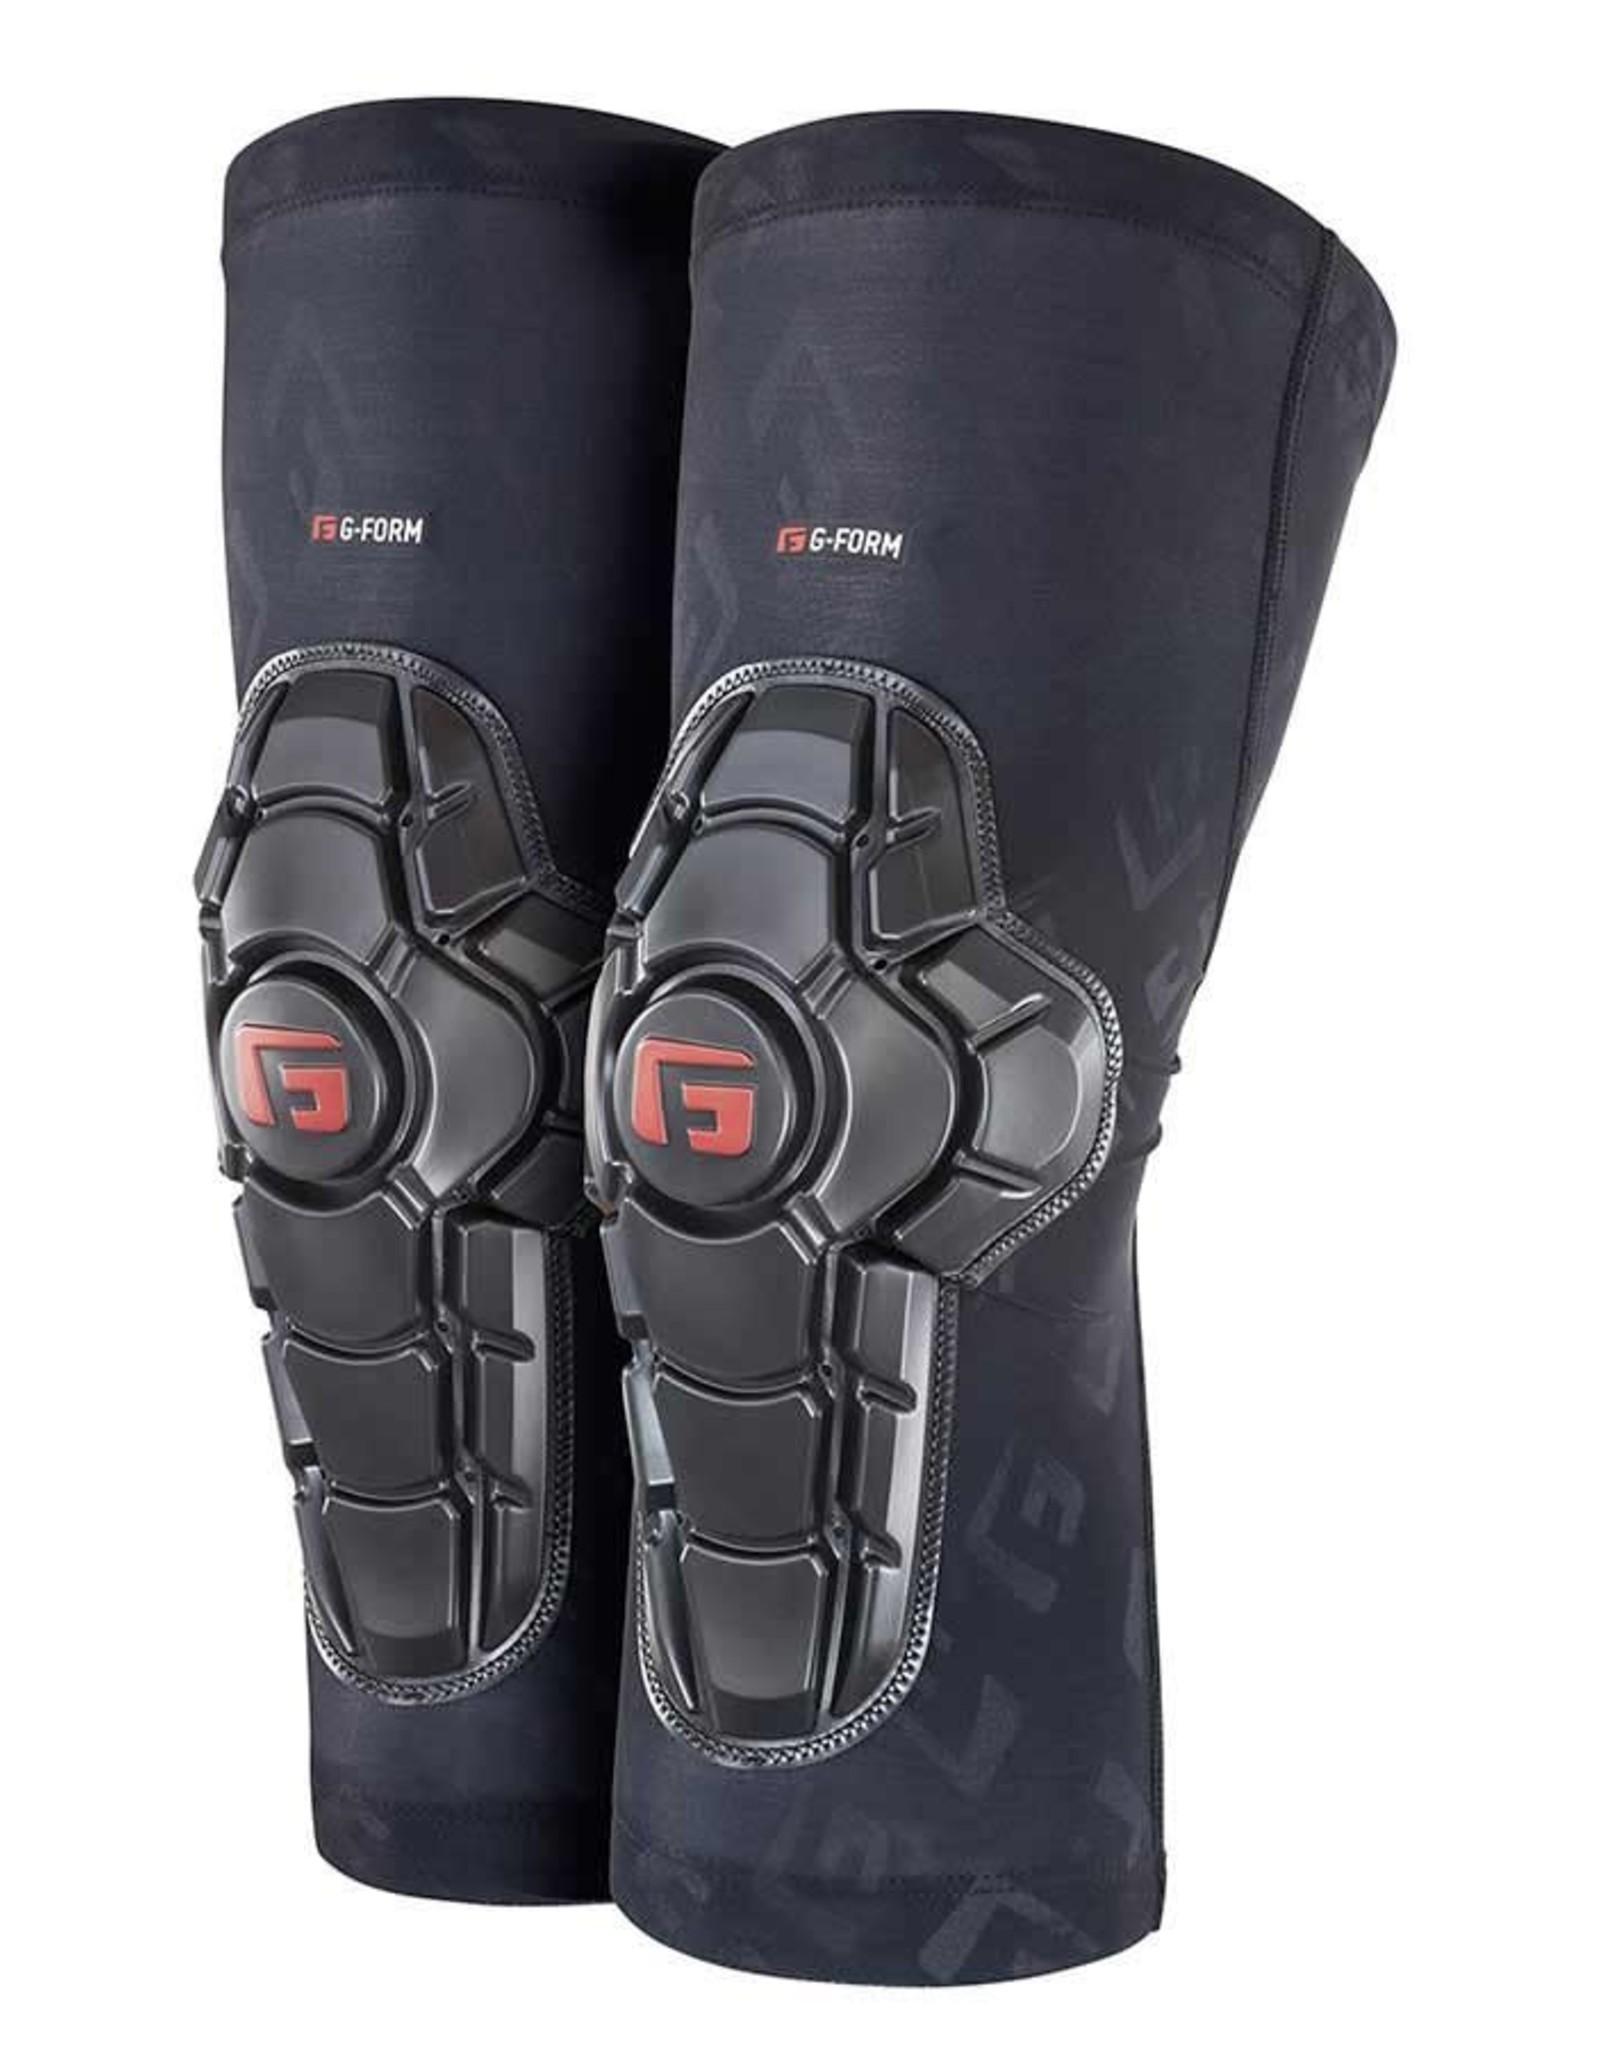 G-FORM G-Form, Pro-X2, Knee Pads-Set